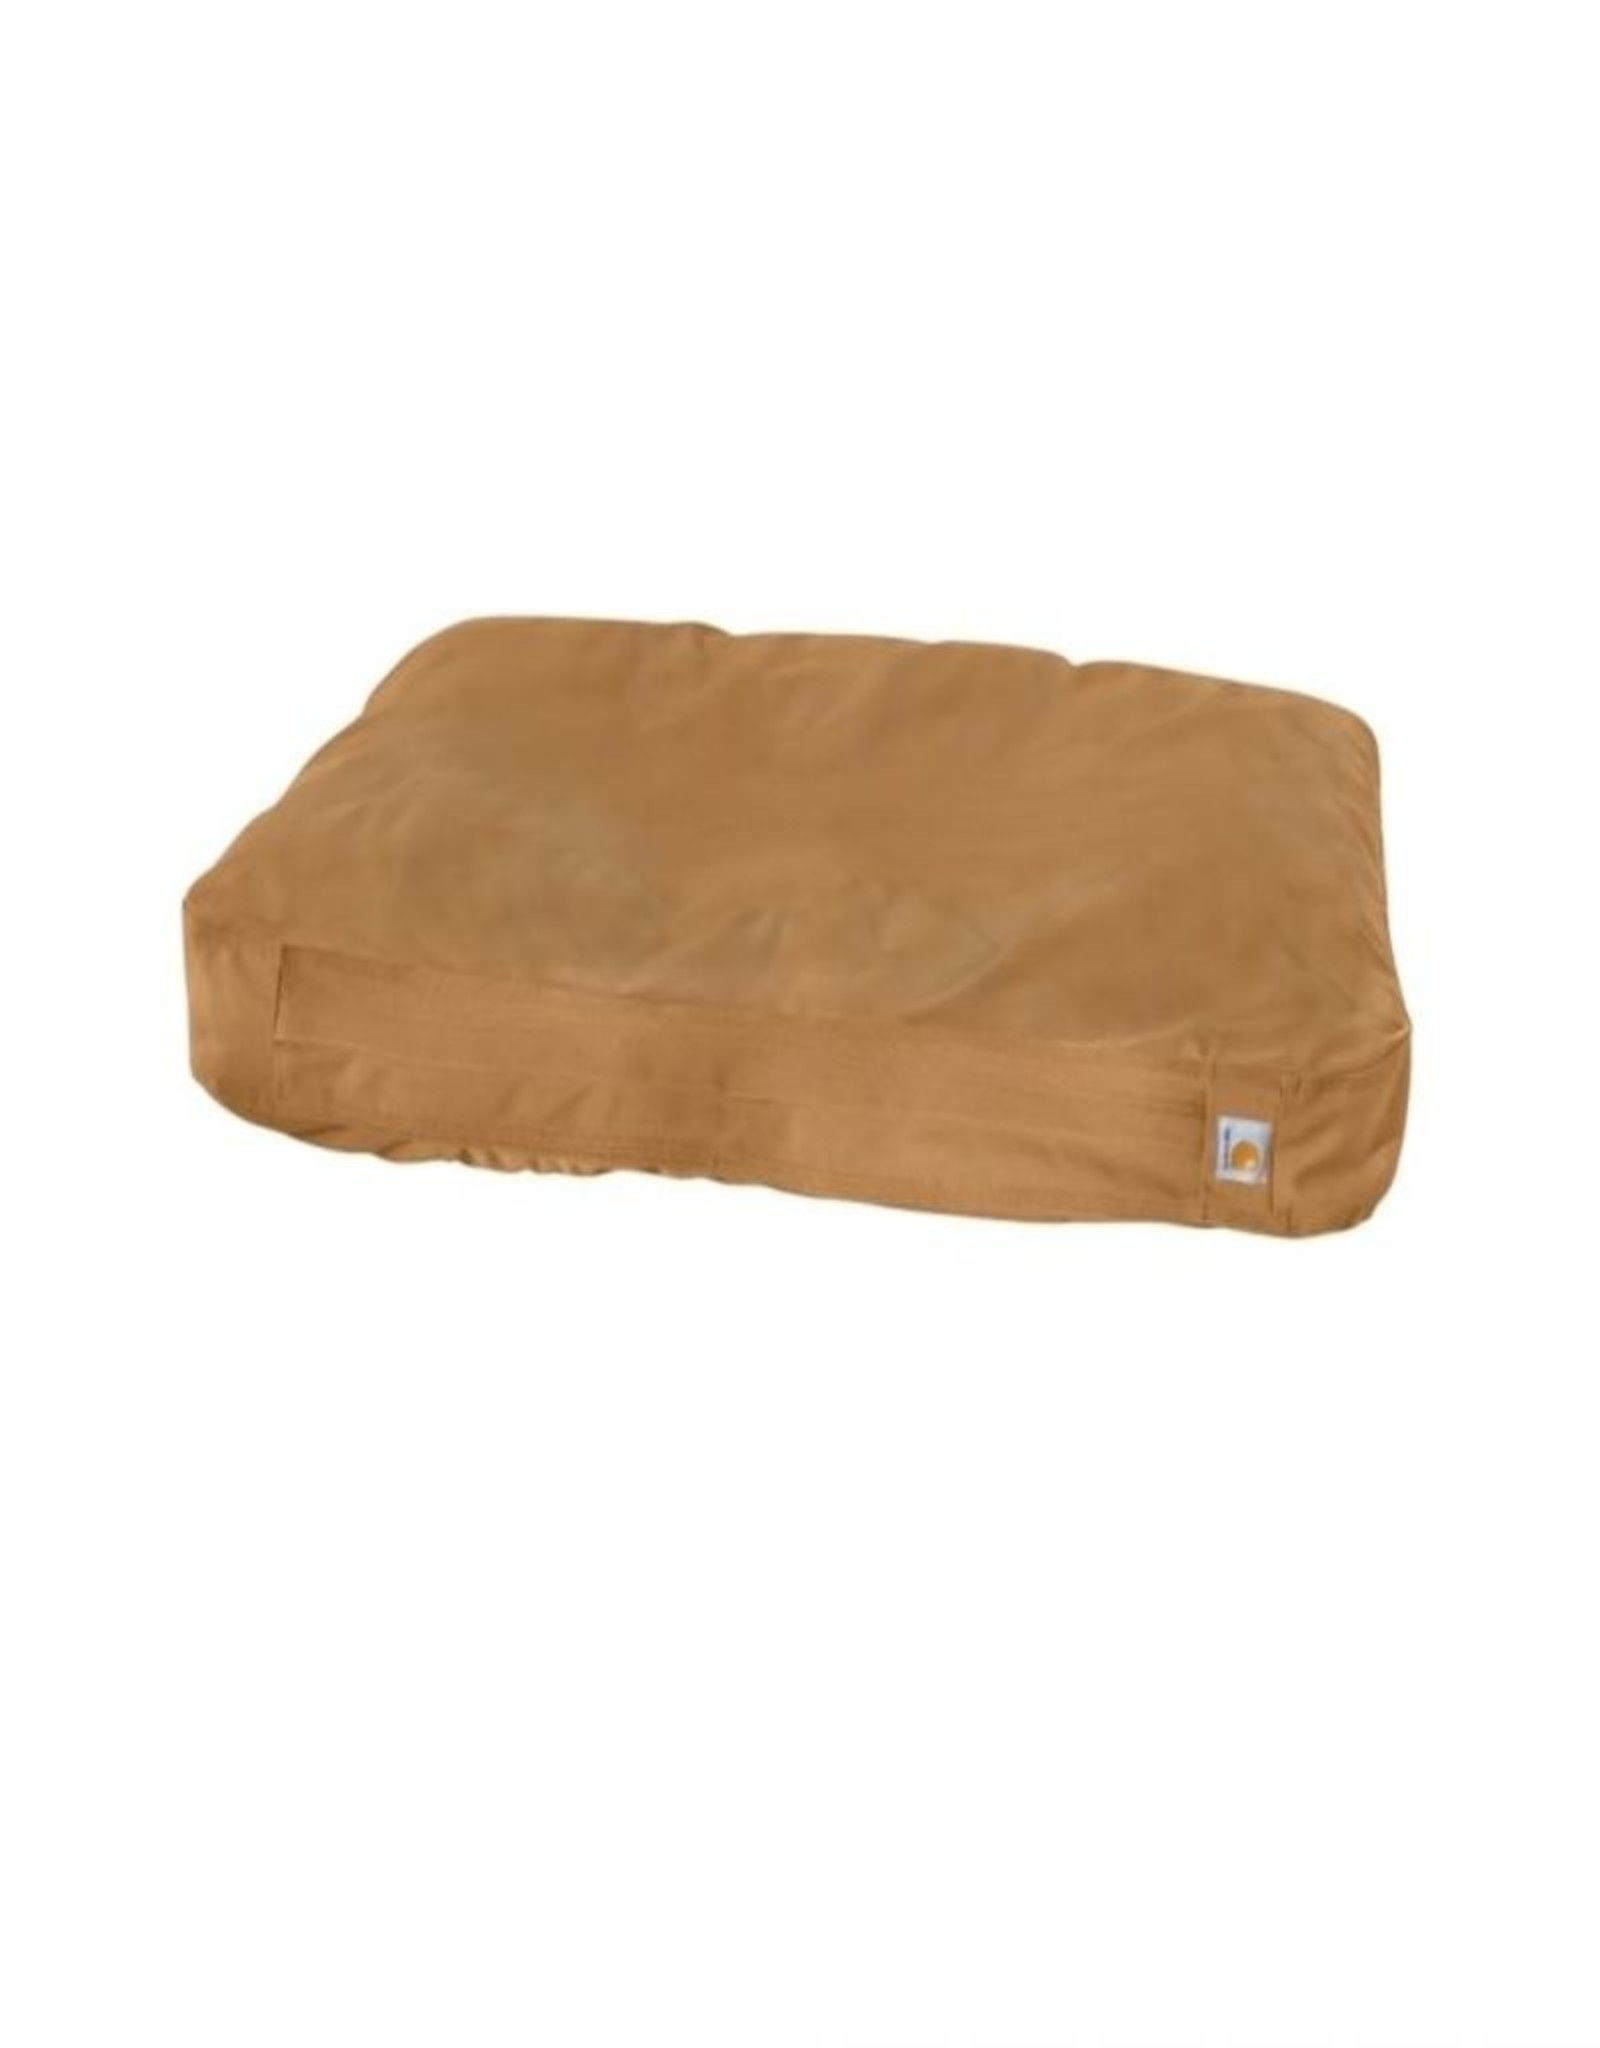 Carhartt Bed